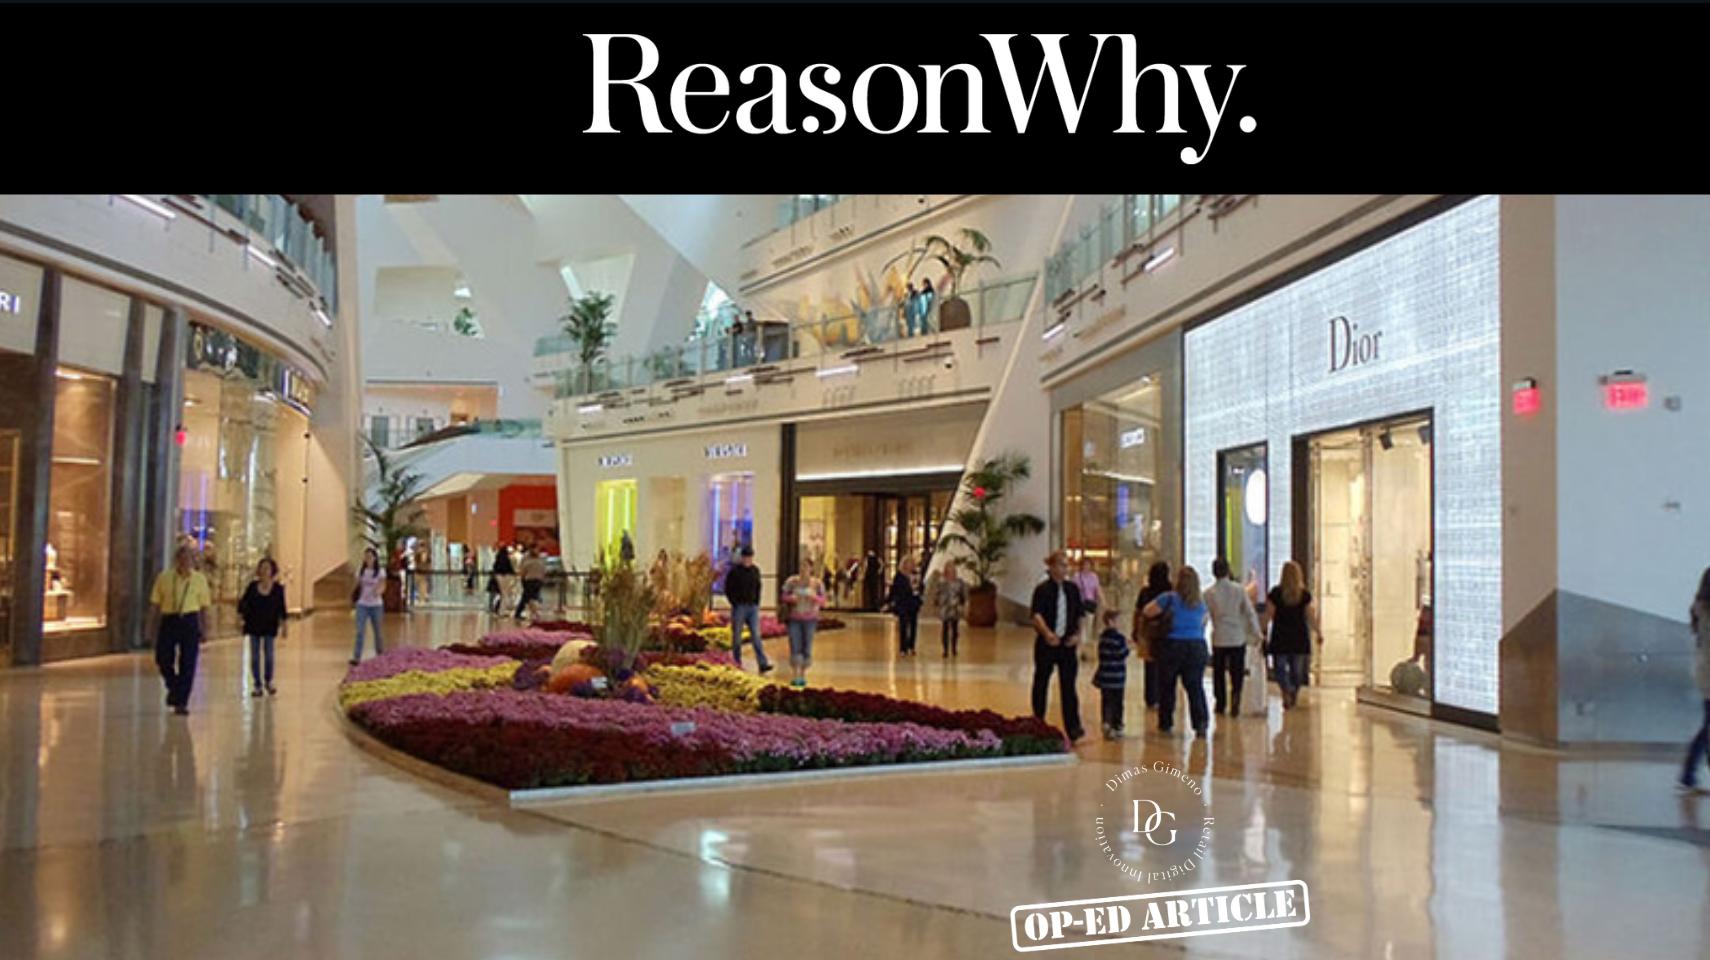 ReasonWhy